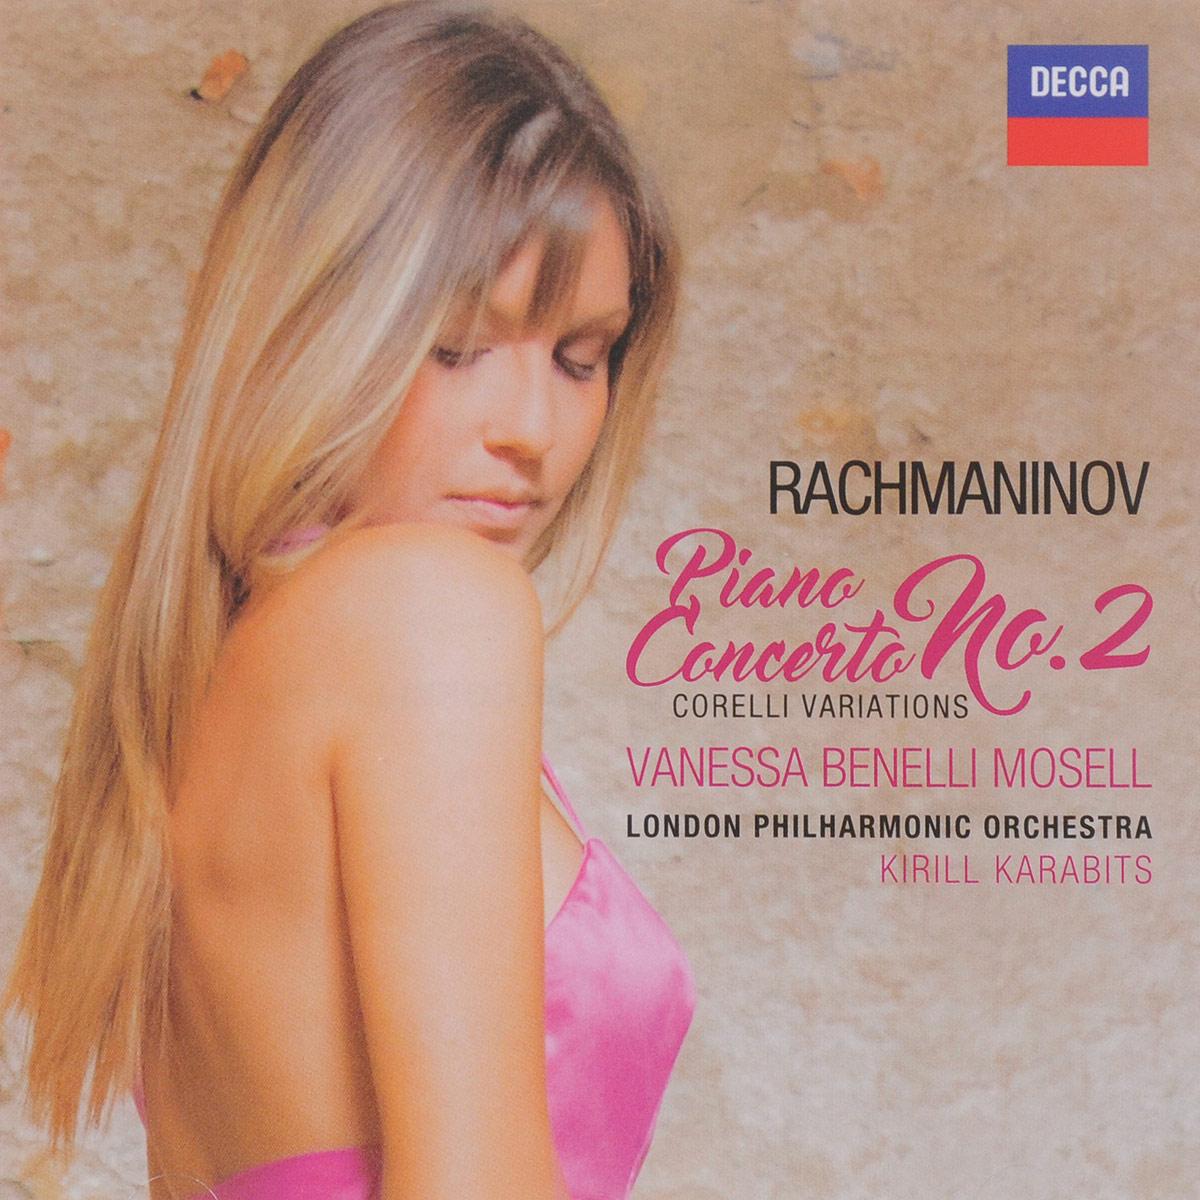 цена на Vanessa Benelli Mosell,London Philharmonic Orchestra,Кирилл Карабитс Vanessa Benelli Mosell. Rachmaninov. Piano Concerto No. 2